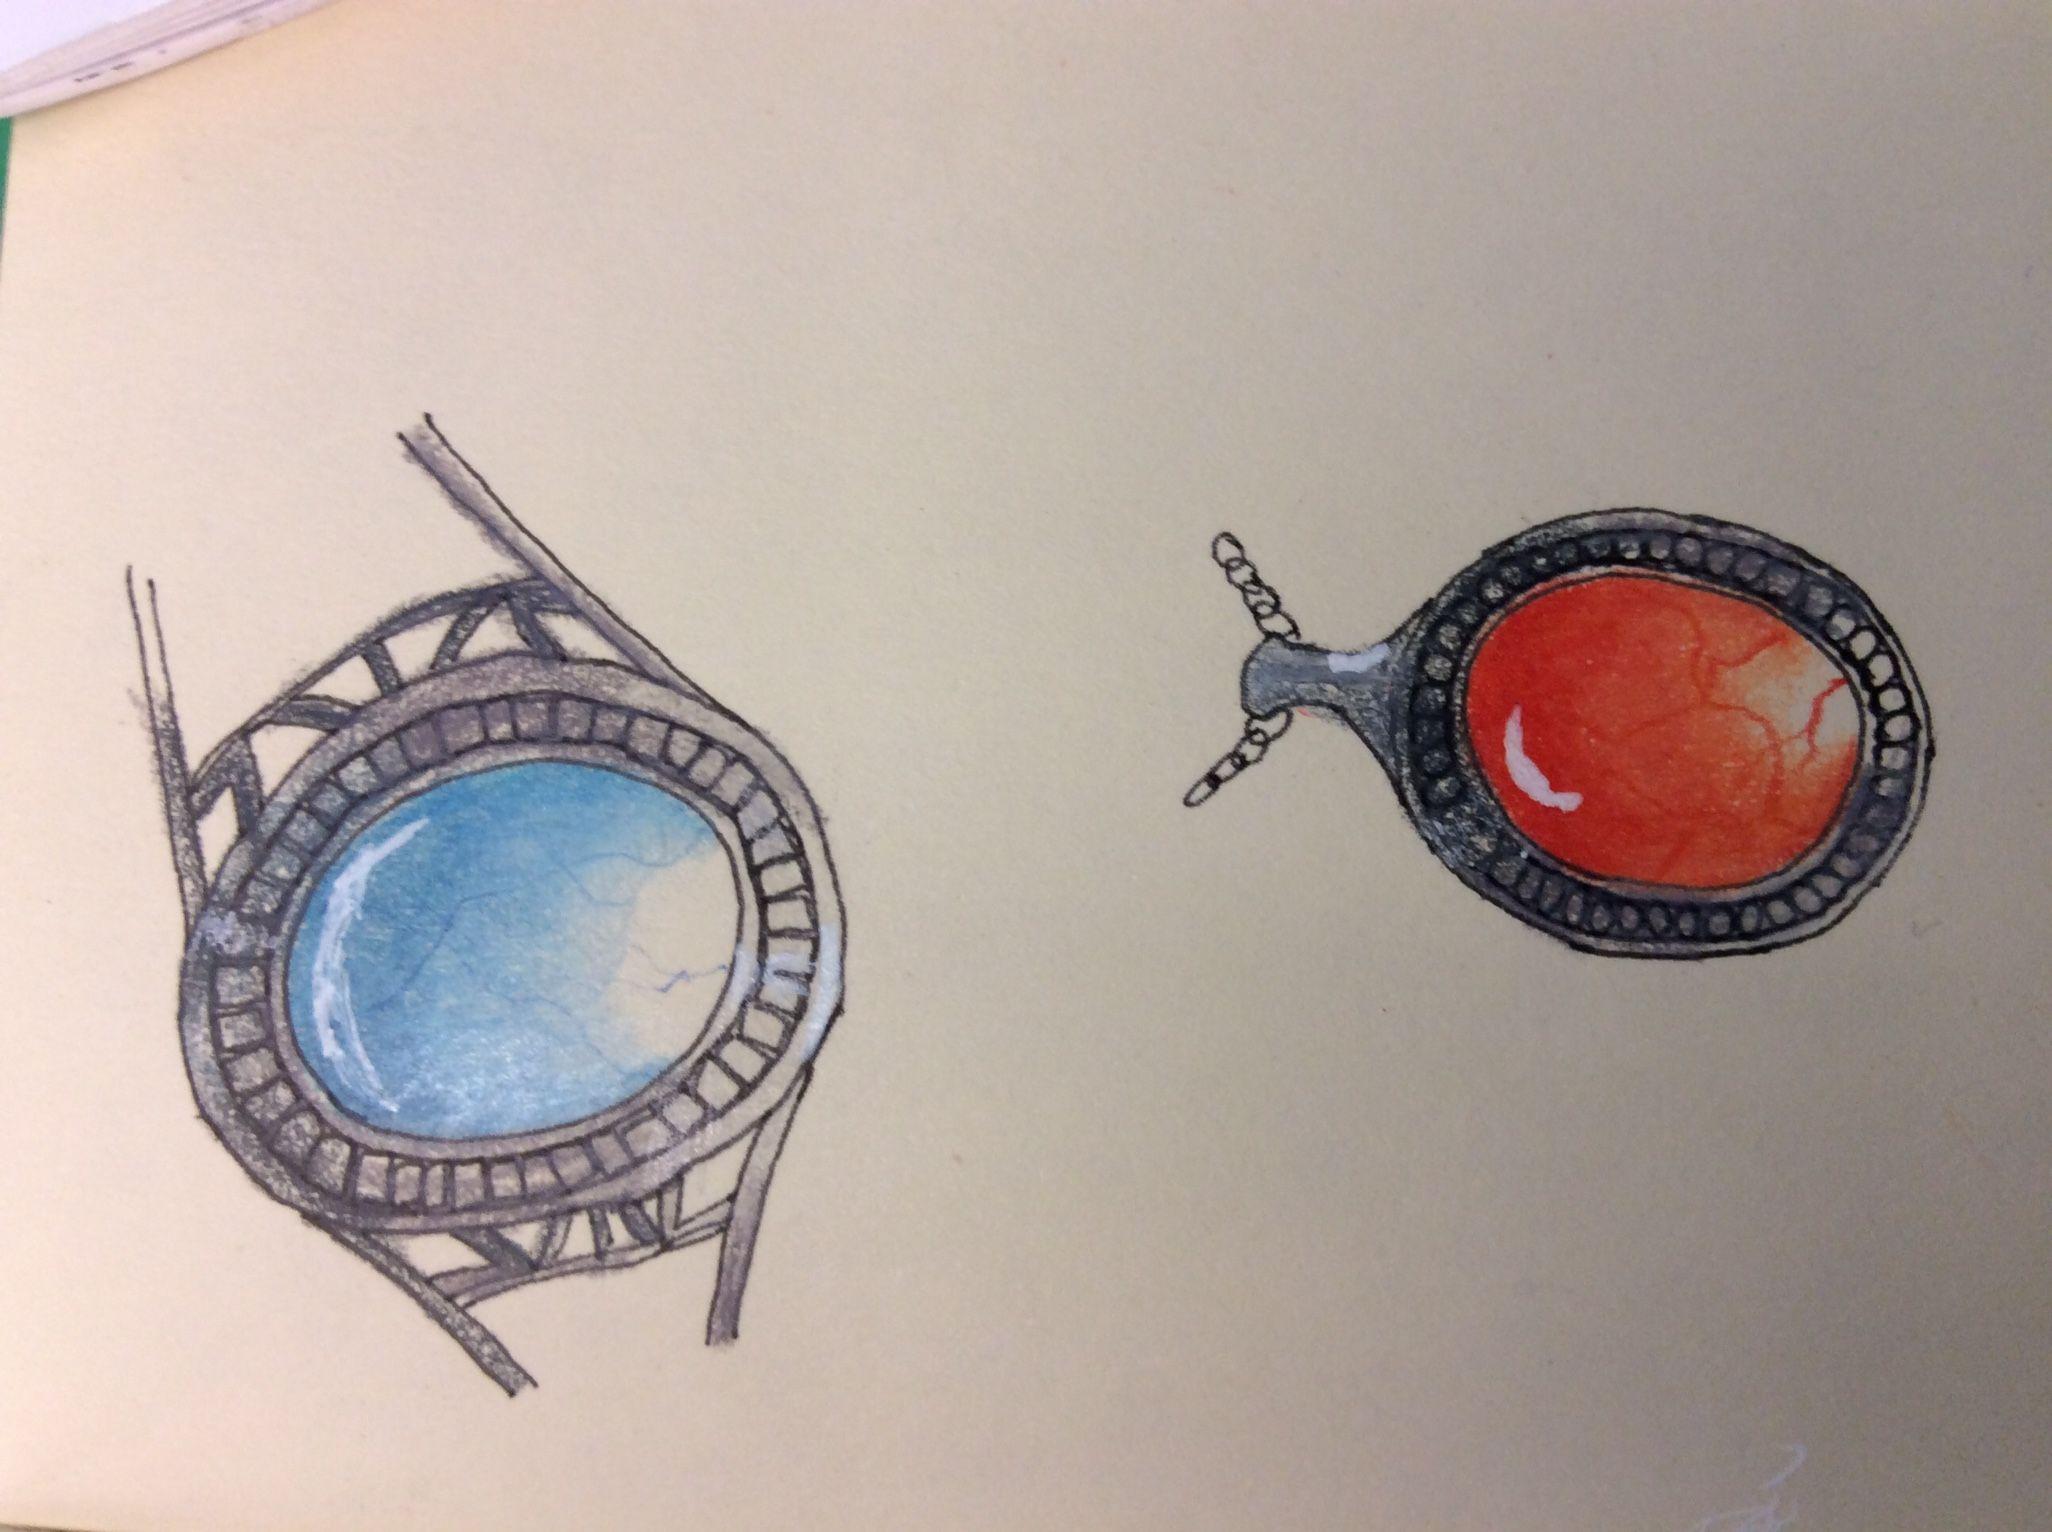 Zentangle gems by Judy of Zen Drawing Club